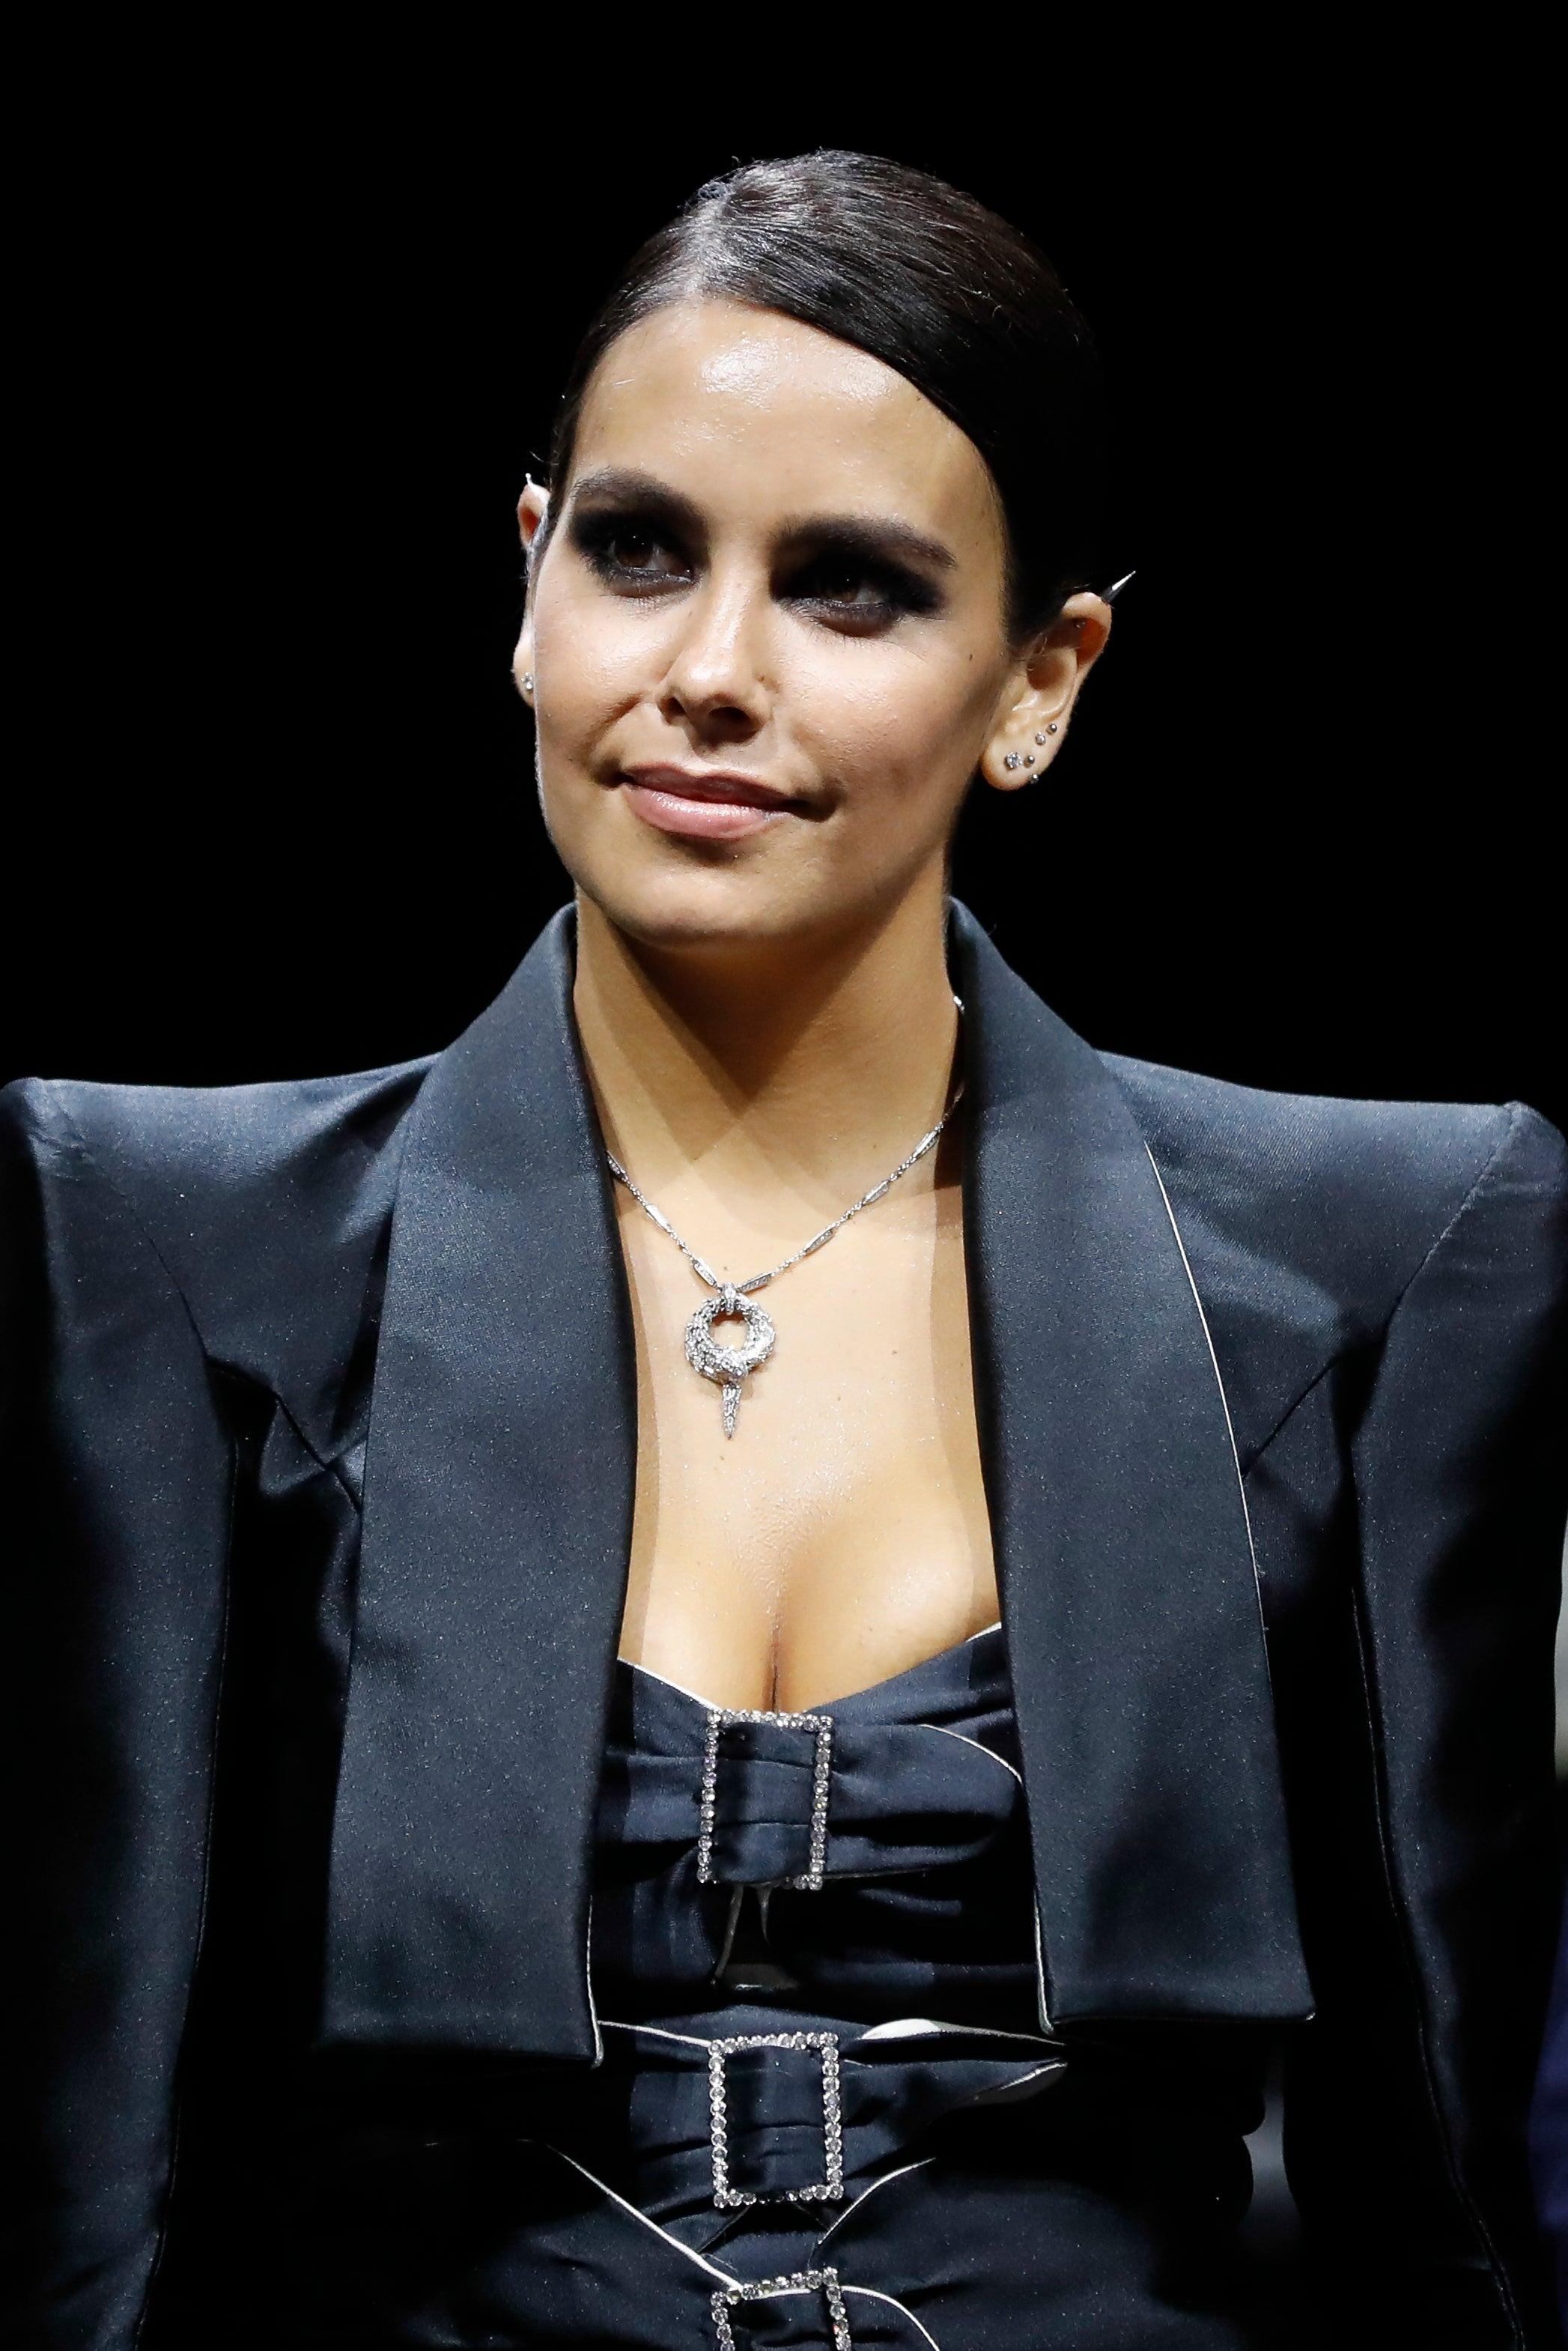 Ana Polvorosa Desnuda https://www.antena3/celebrities/famosos-sexy/anabel